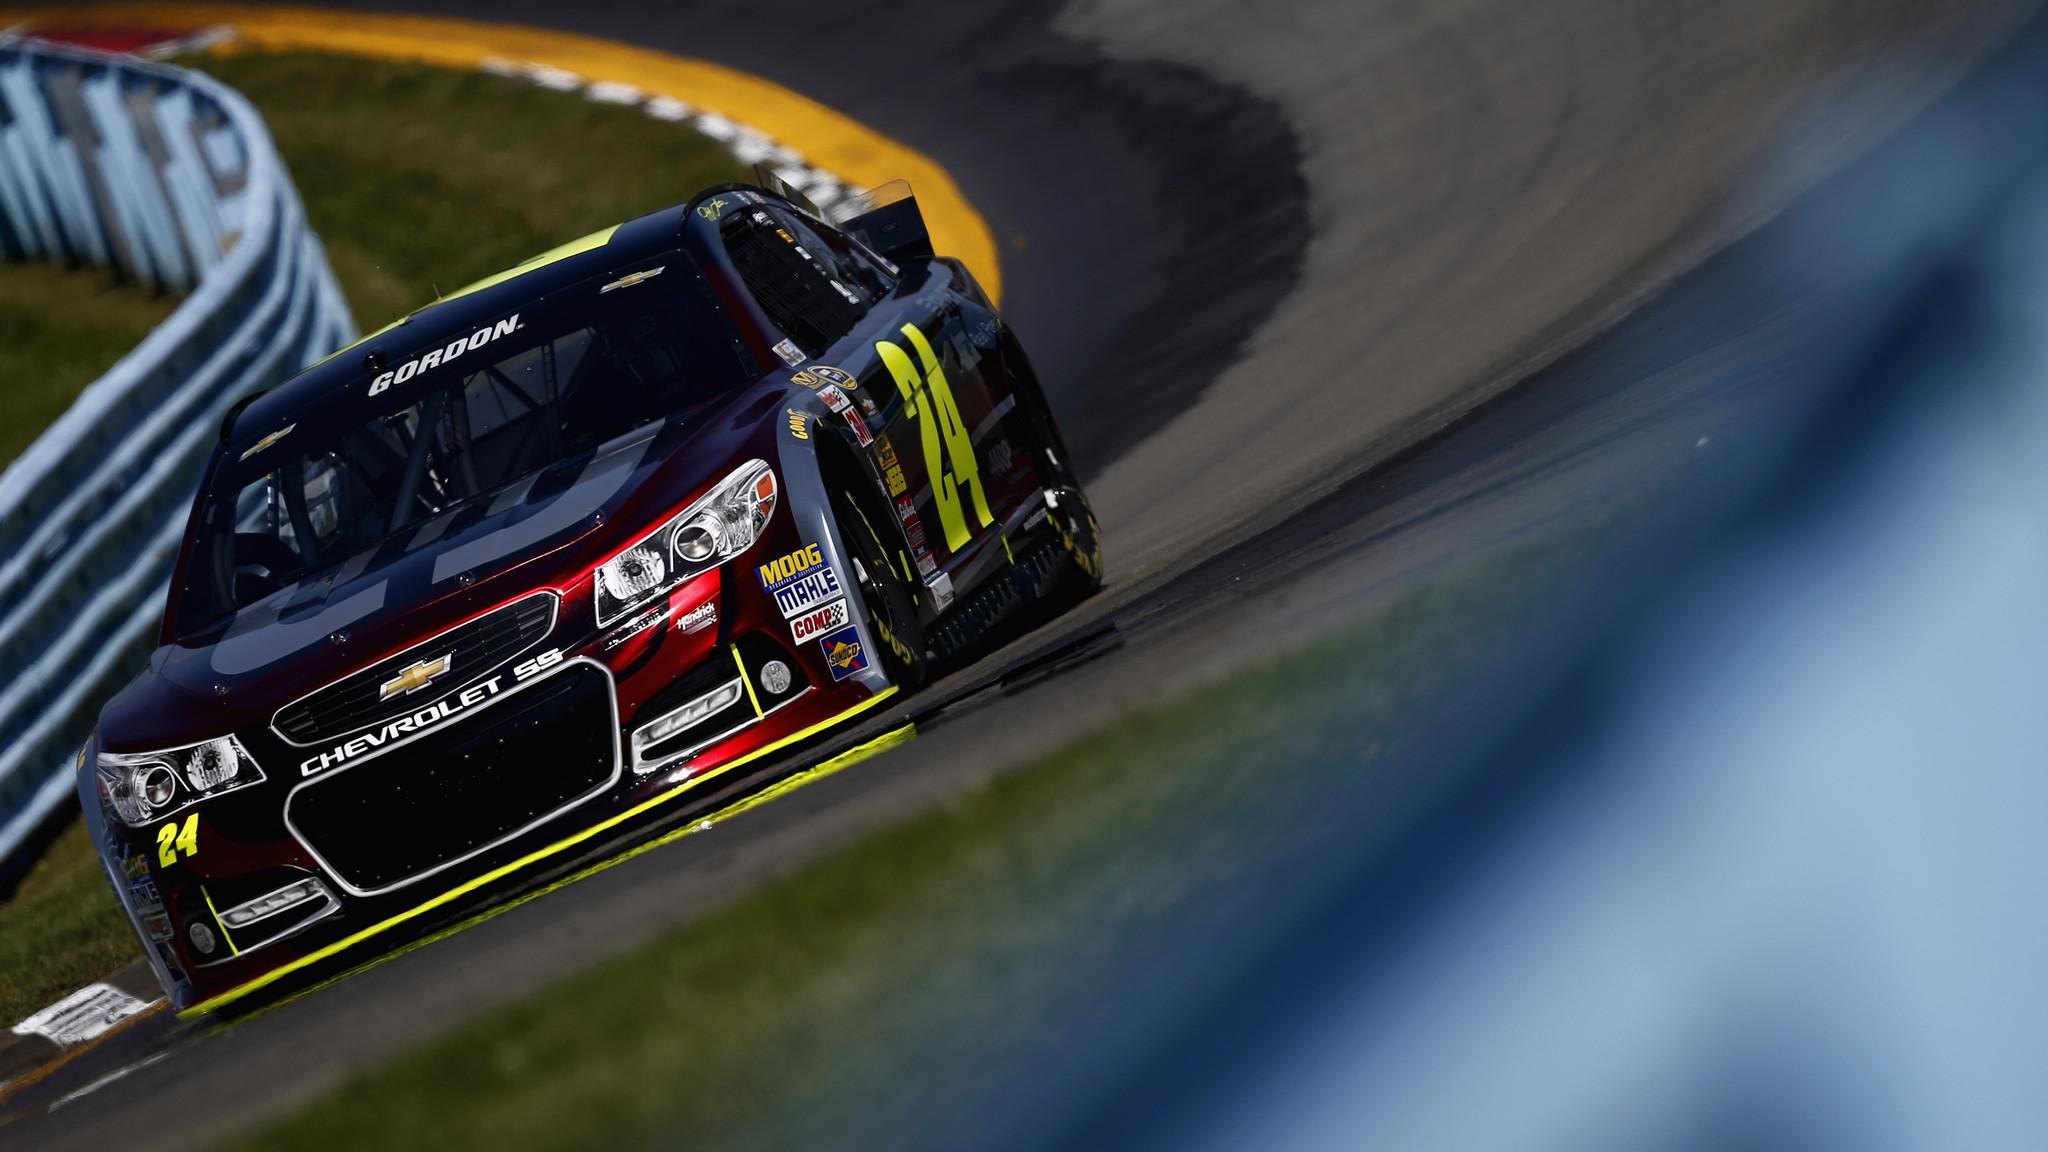 Nascar Pole Position >> Jeff Gordon takes pole position for NASCAR Watkins Glen race - LA Times